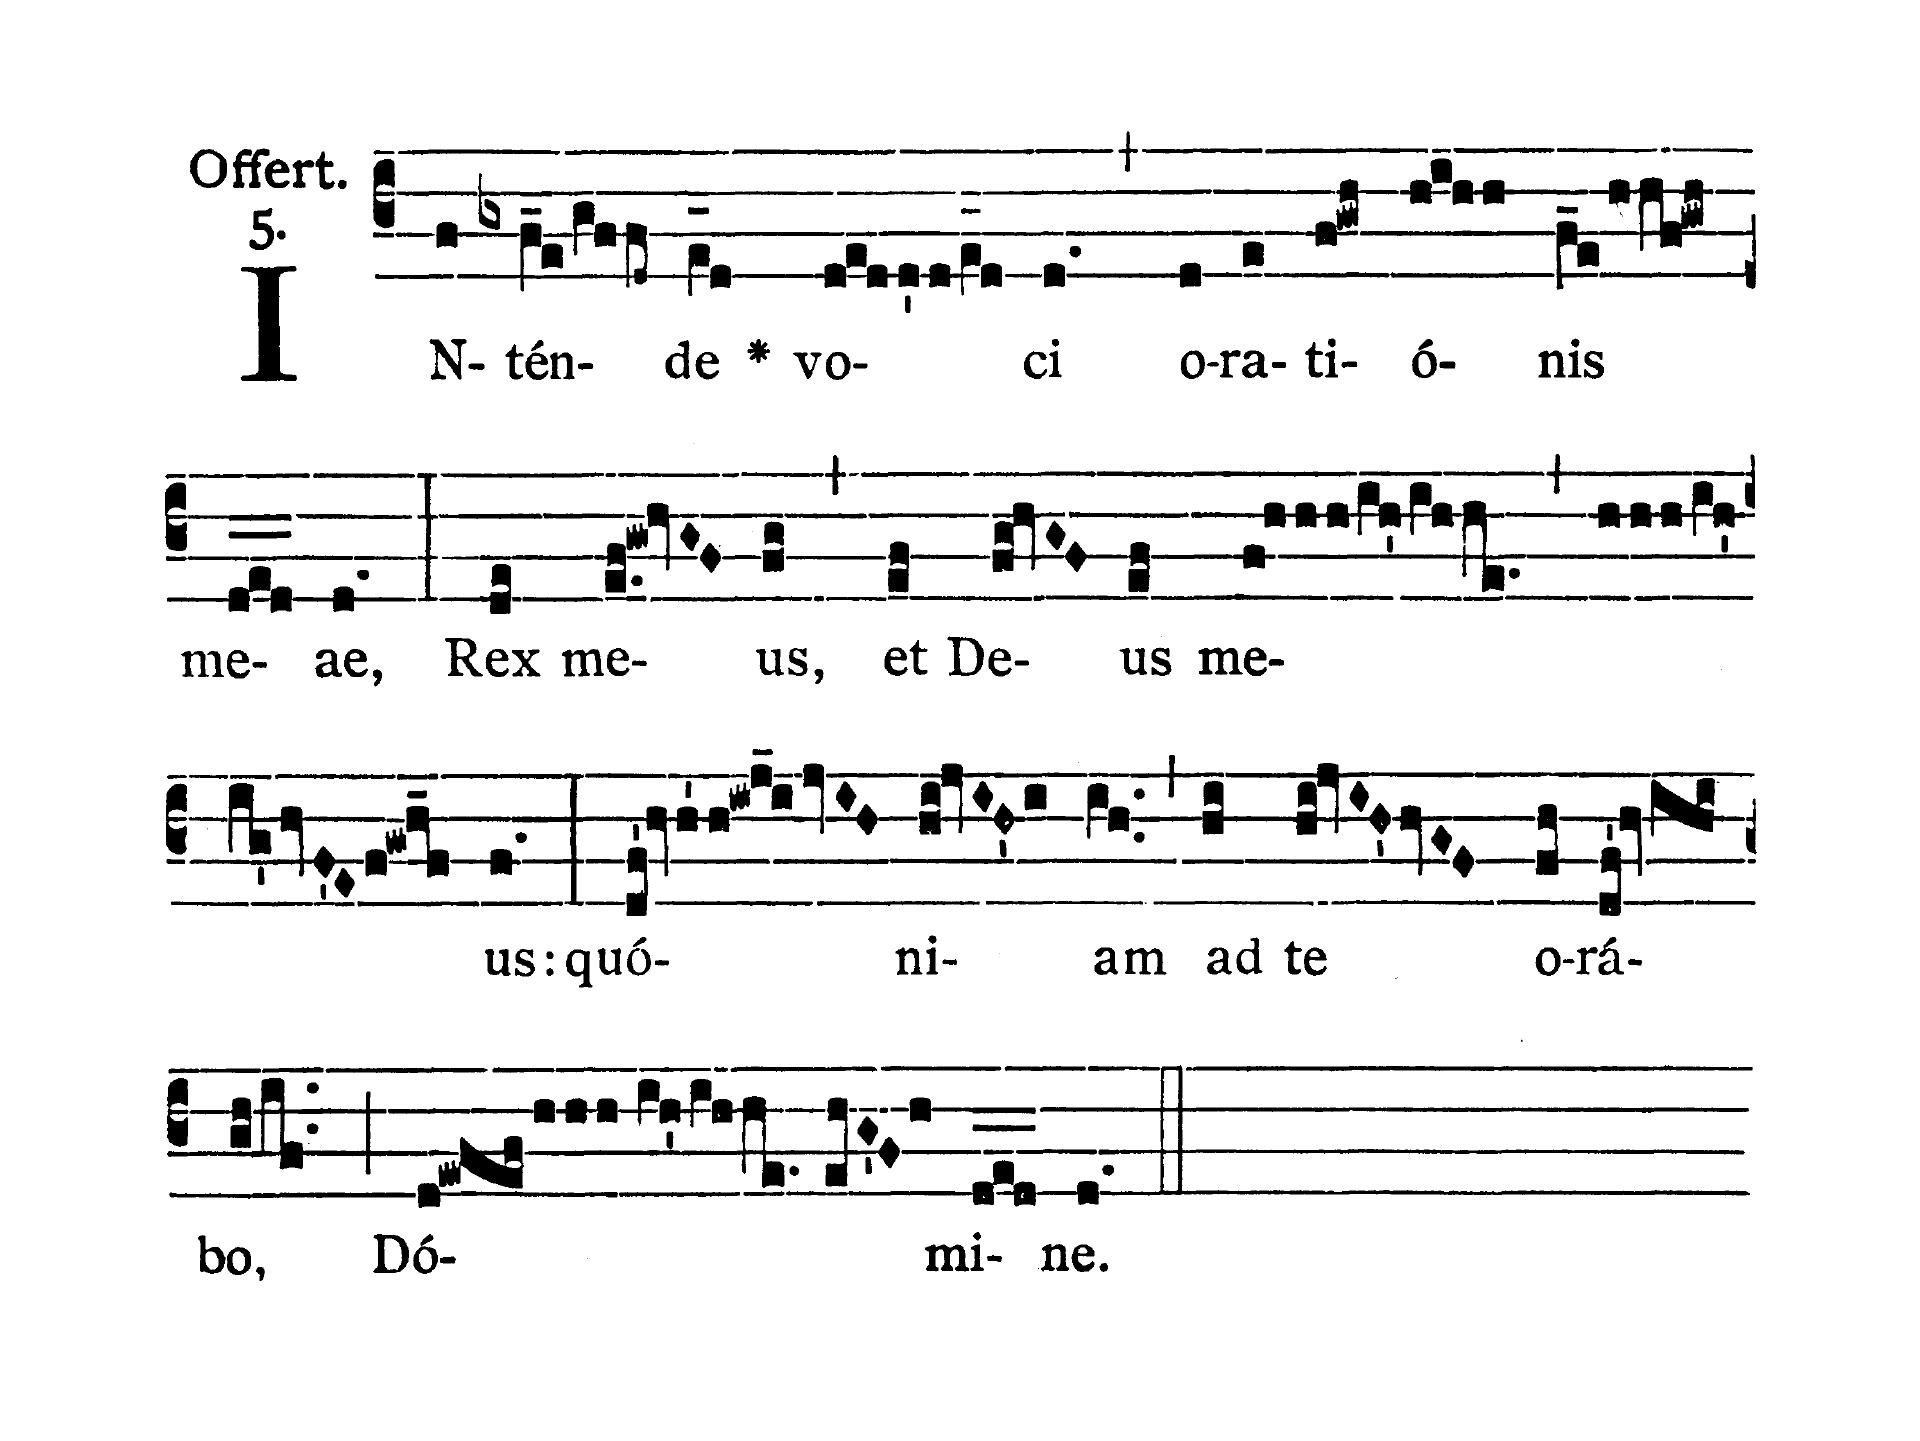 Feria VI post Dominicam III Quadragesimae (Piątek po III Niedzieli Wielkiego Postu) - Offertorium (Intende voci)